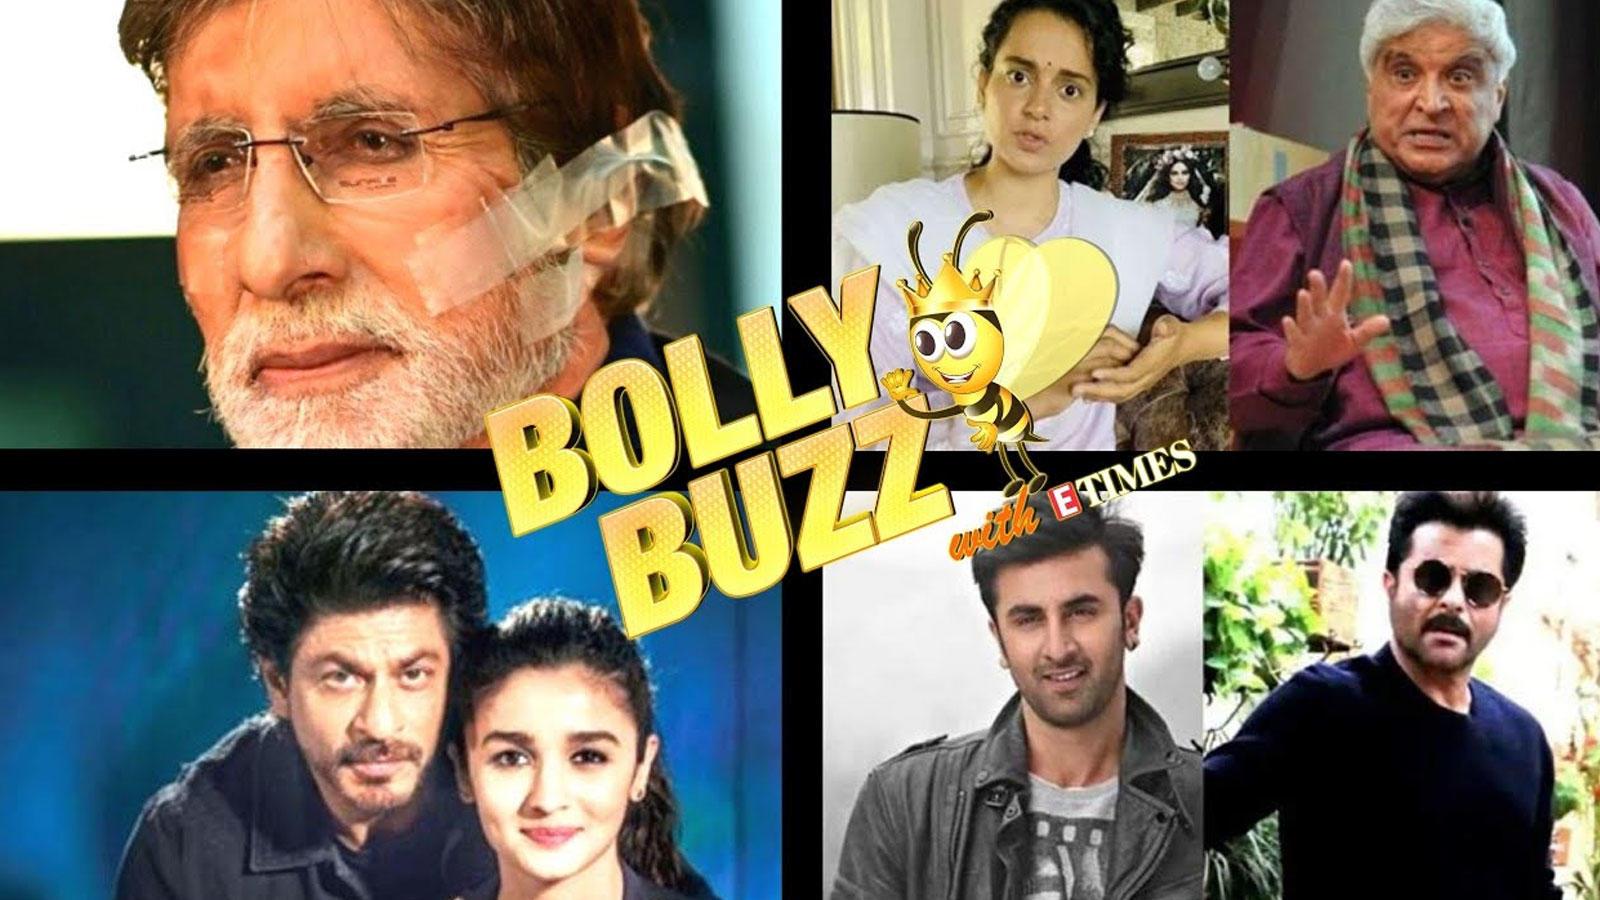 bolly-buzz-amitabh-bachchans-surgery-warrant-against-kangana-ranaut-srk-and-alia-bhatts-darlings